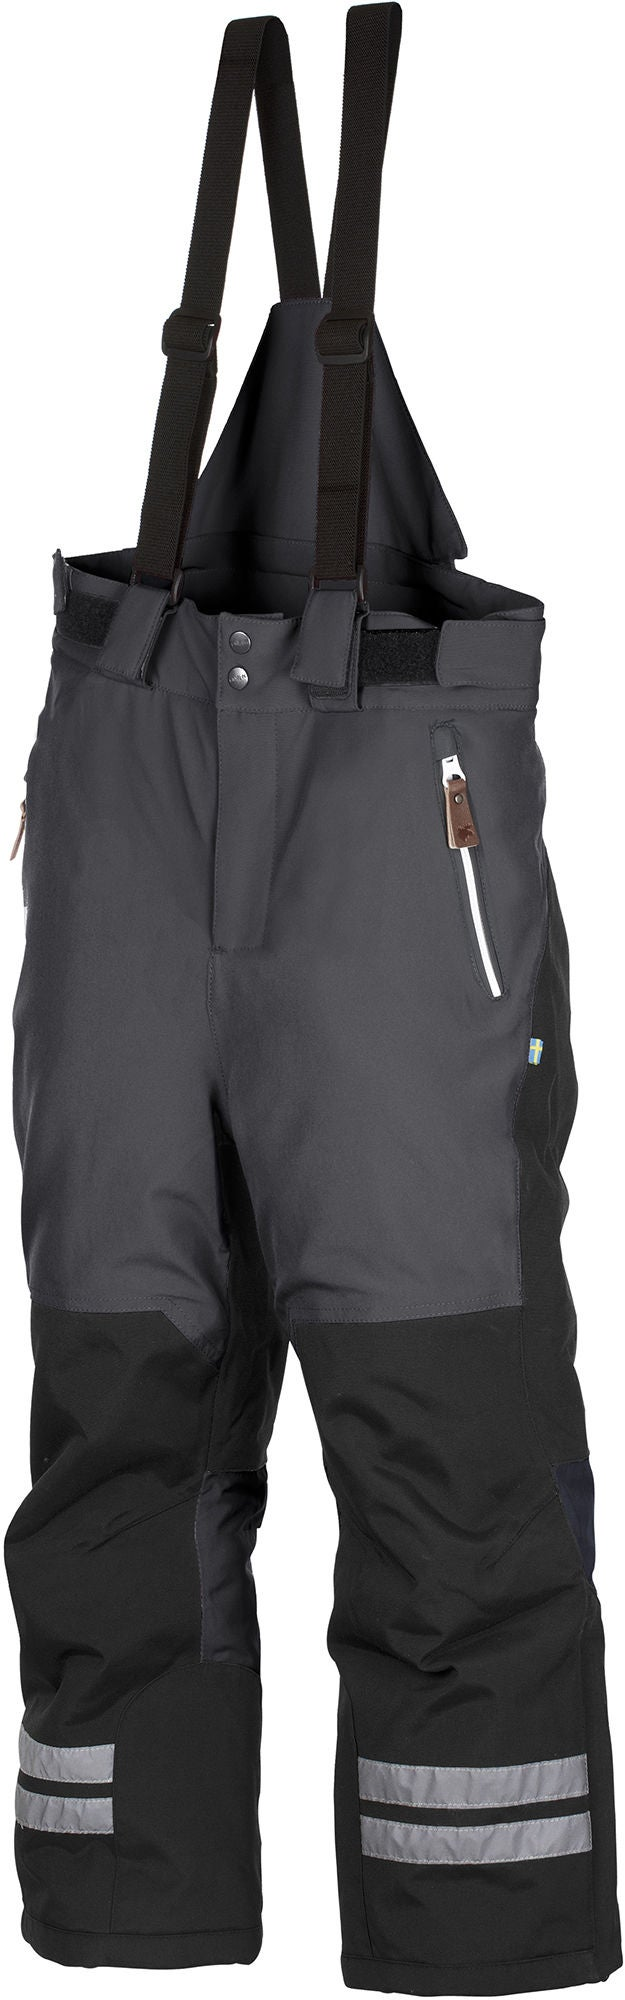 Lindberg Keystone Bukse, Anthracite 90